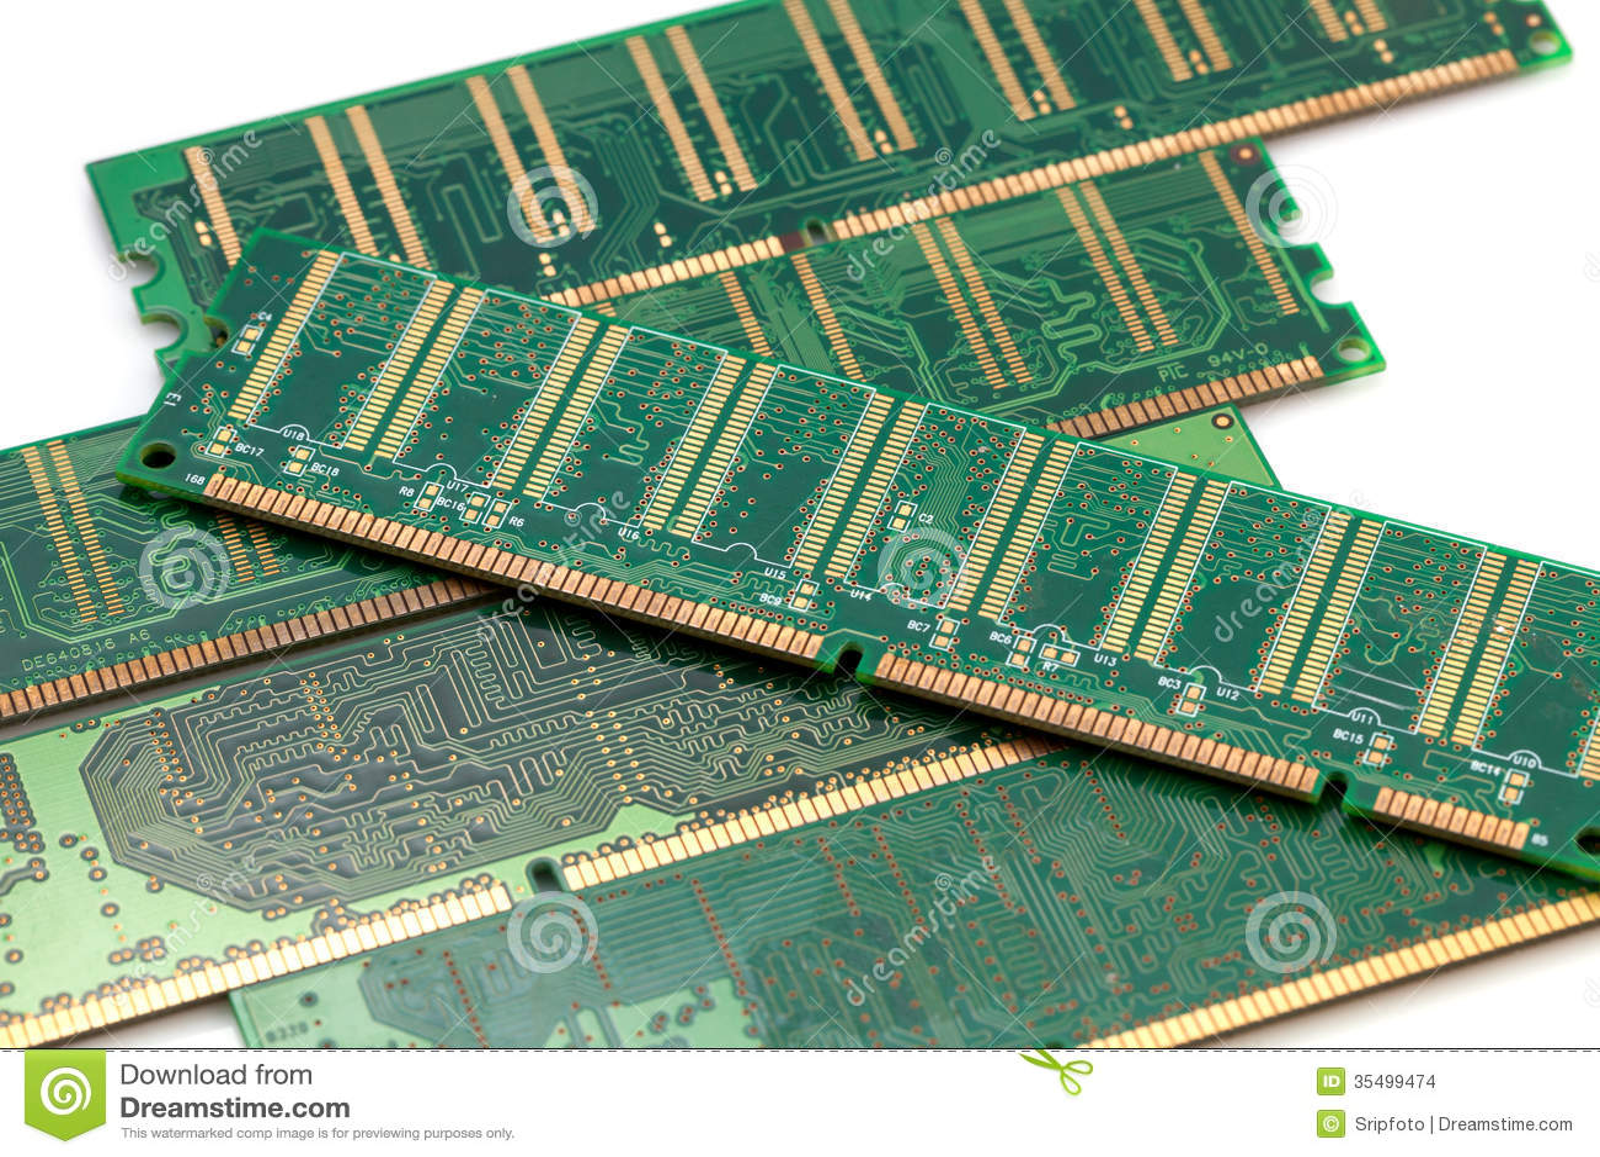 Random Access Memory (RAM) Stock Images - Image: 35499474